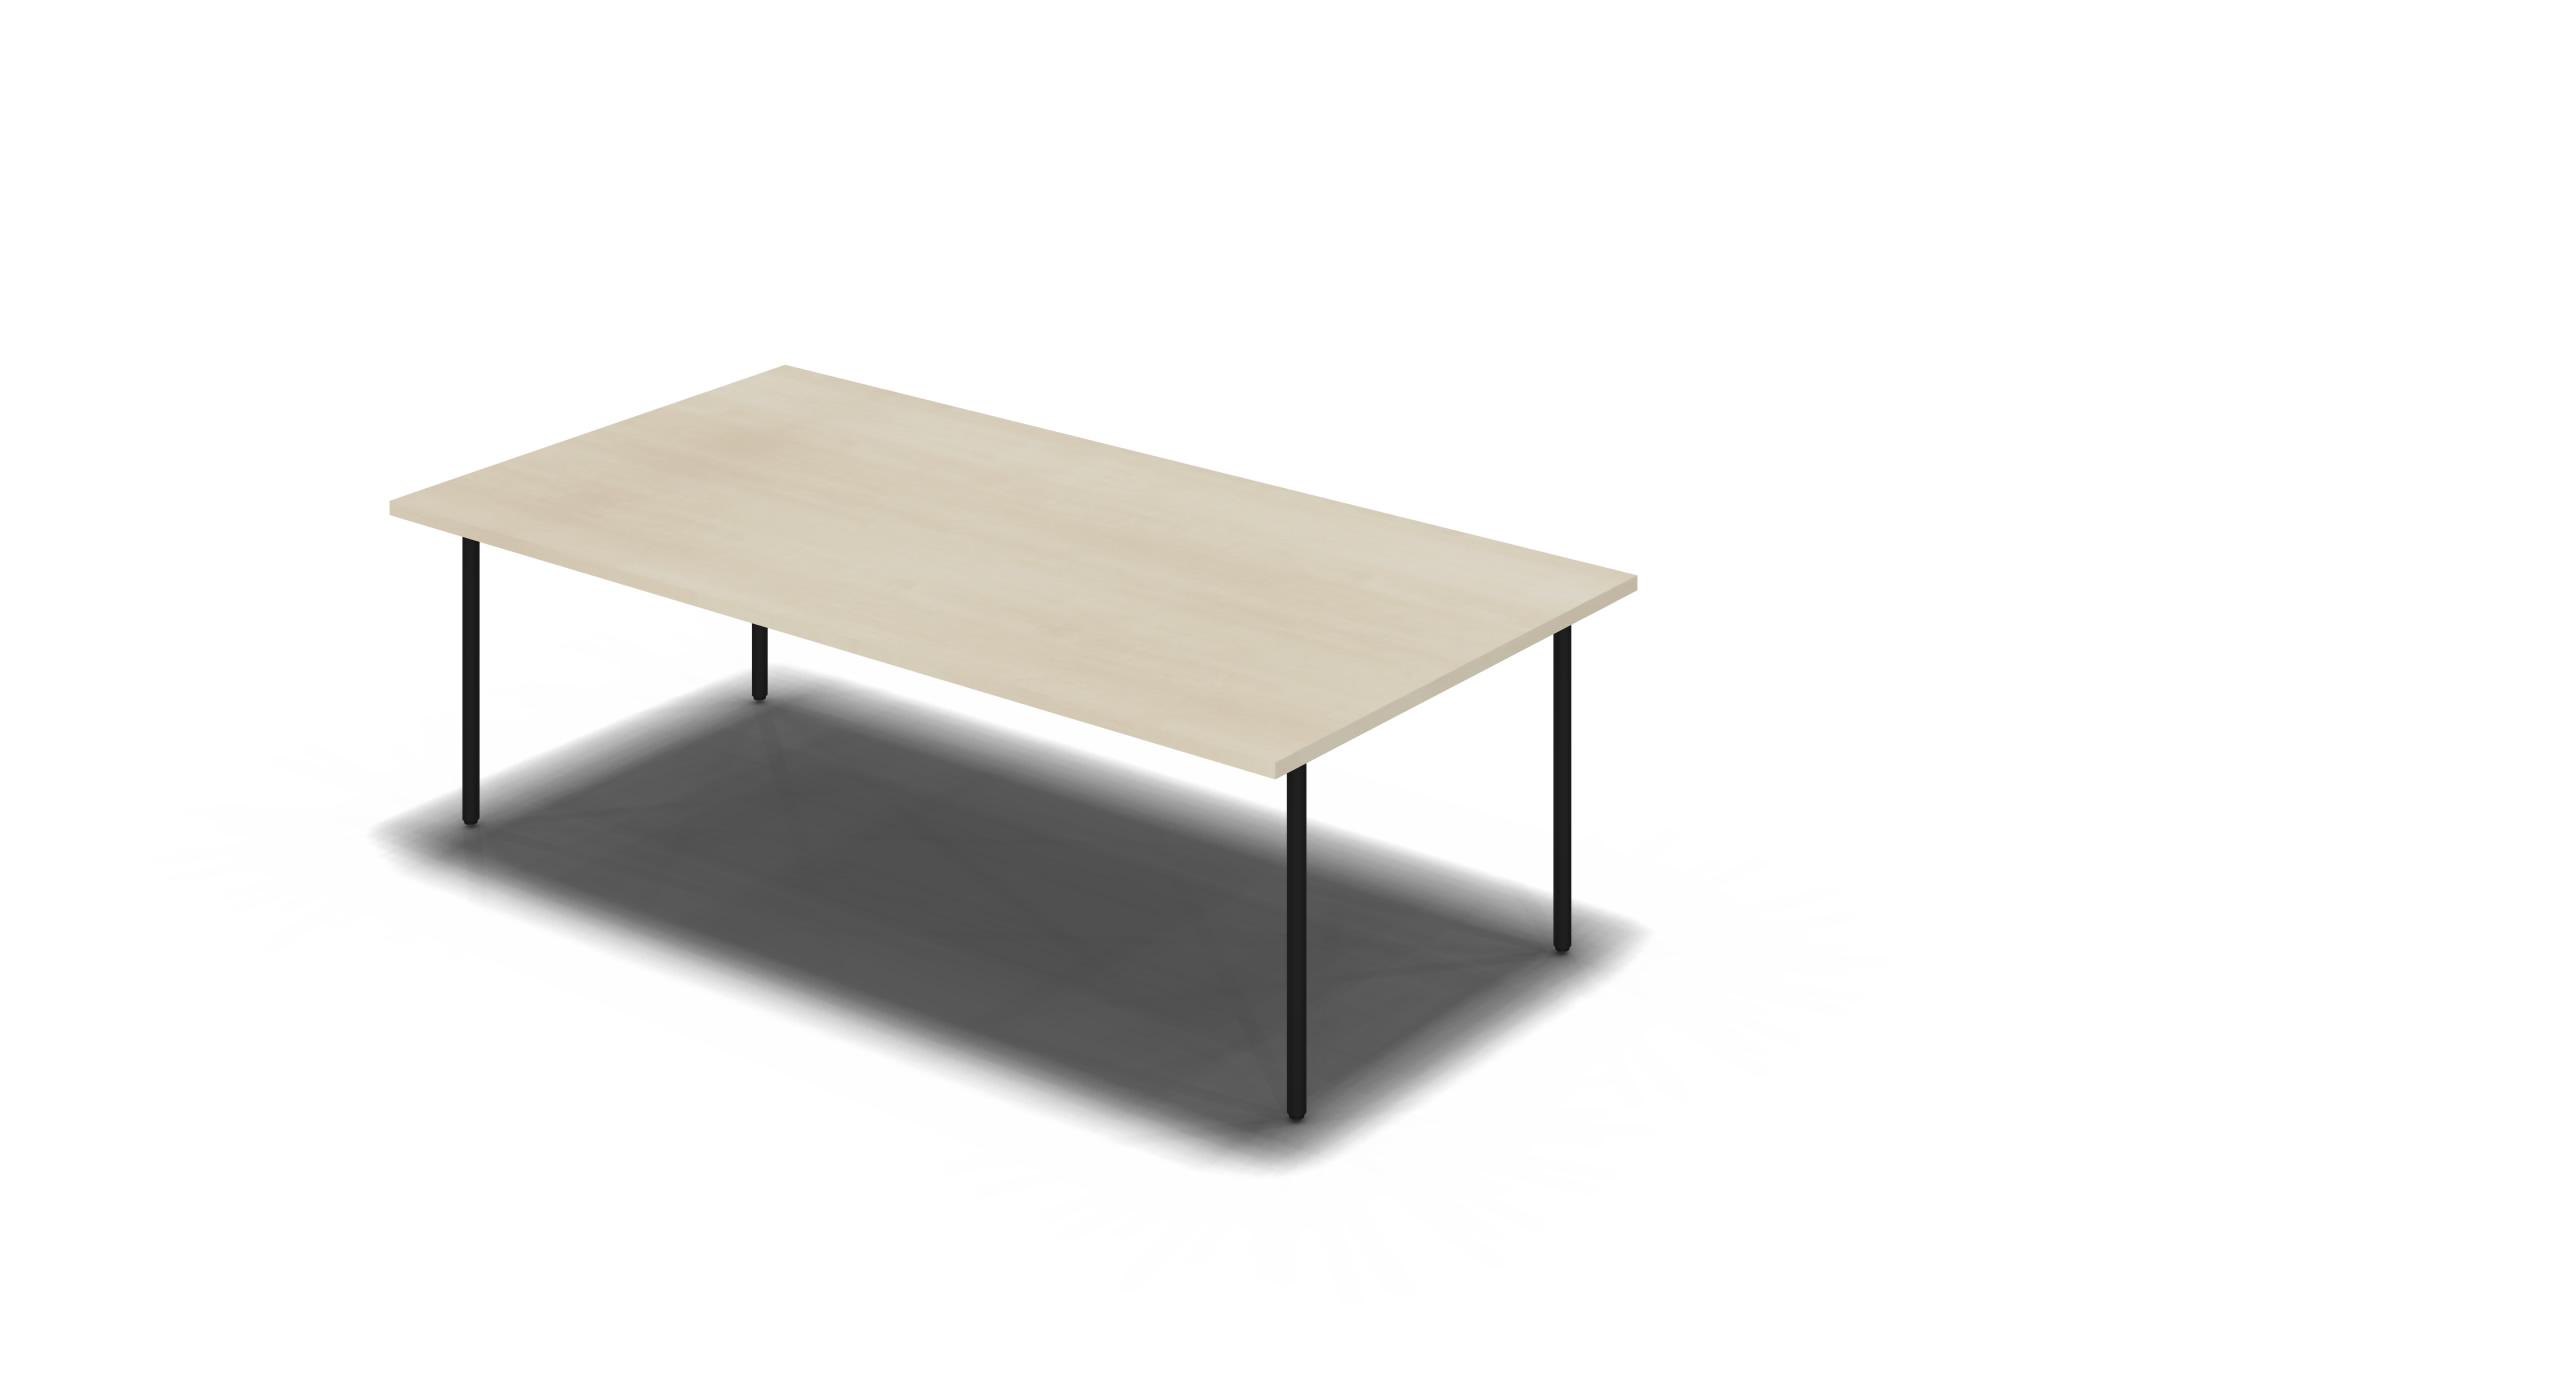 Table_Round_2100x1050_Black_Maple_noOption